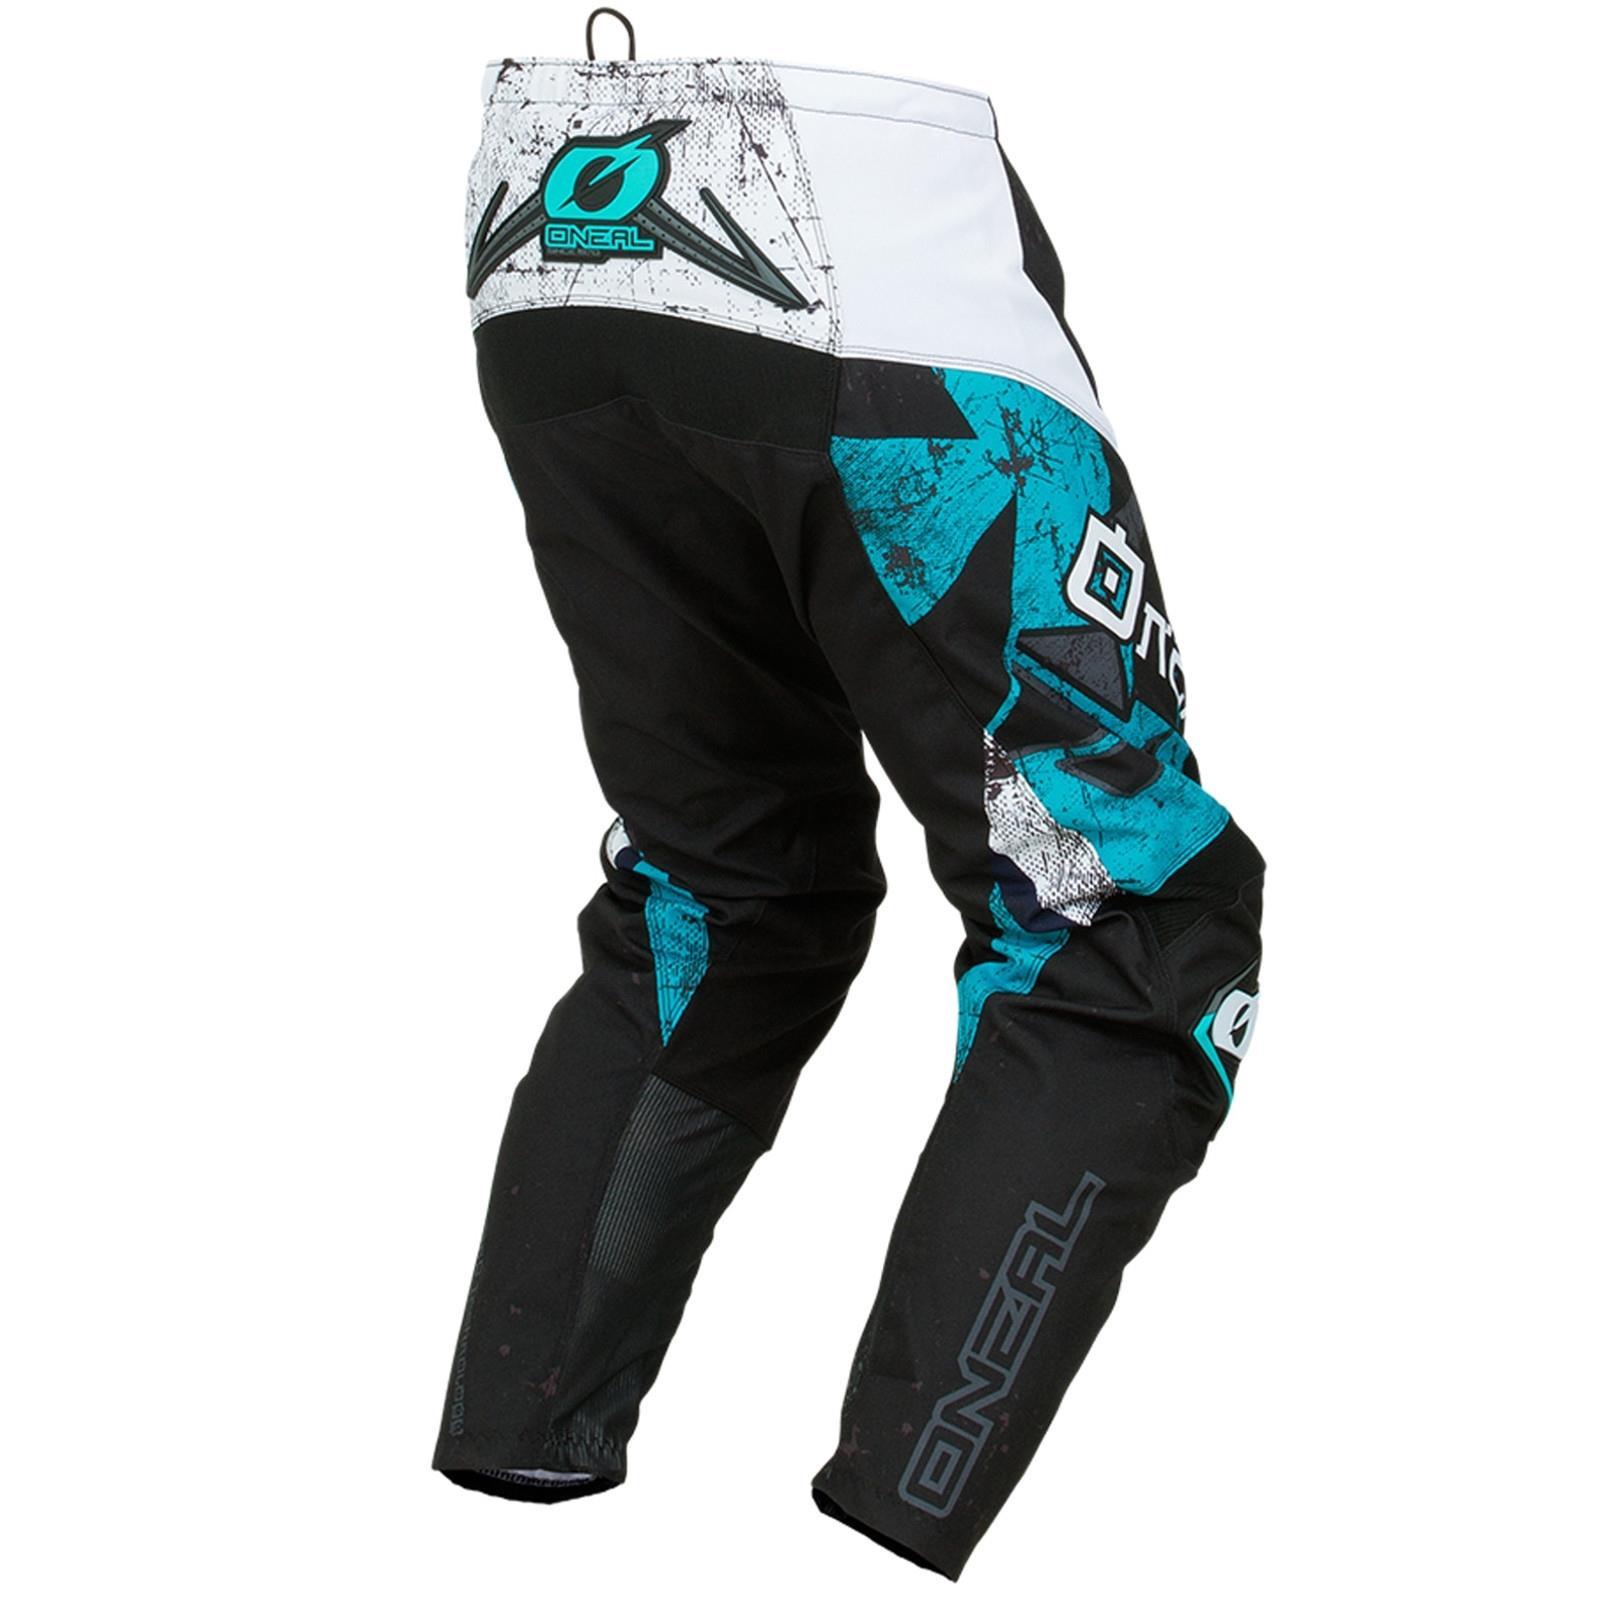 Oneal-elemento-Mayhem-Hardwear-Pants-pantalones-MX-DH-FR-Moto-Cross-Enduro-MTB-moto miniatura 43